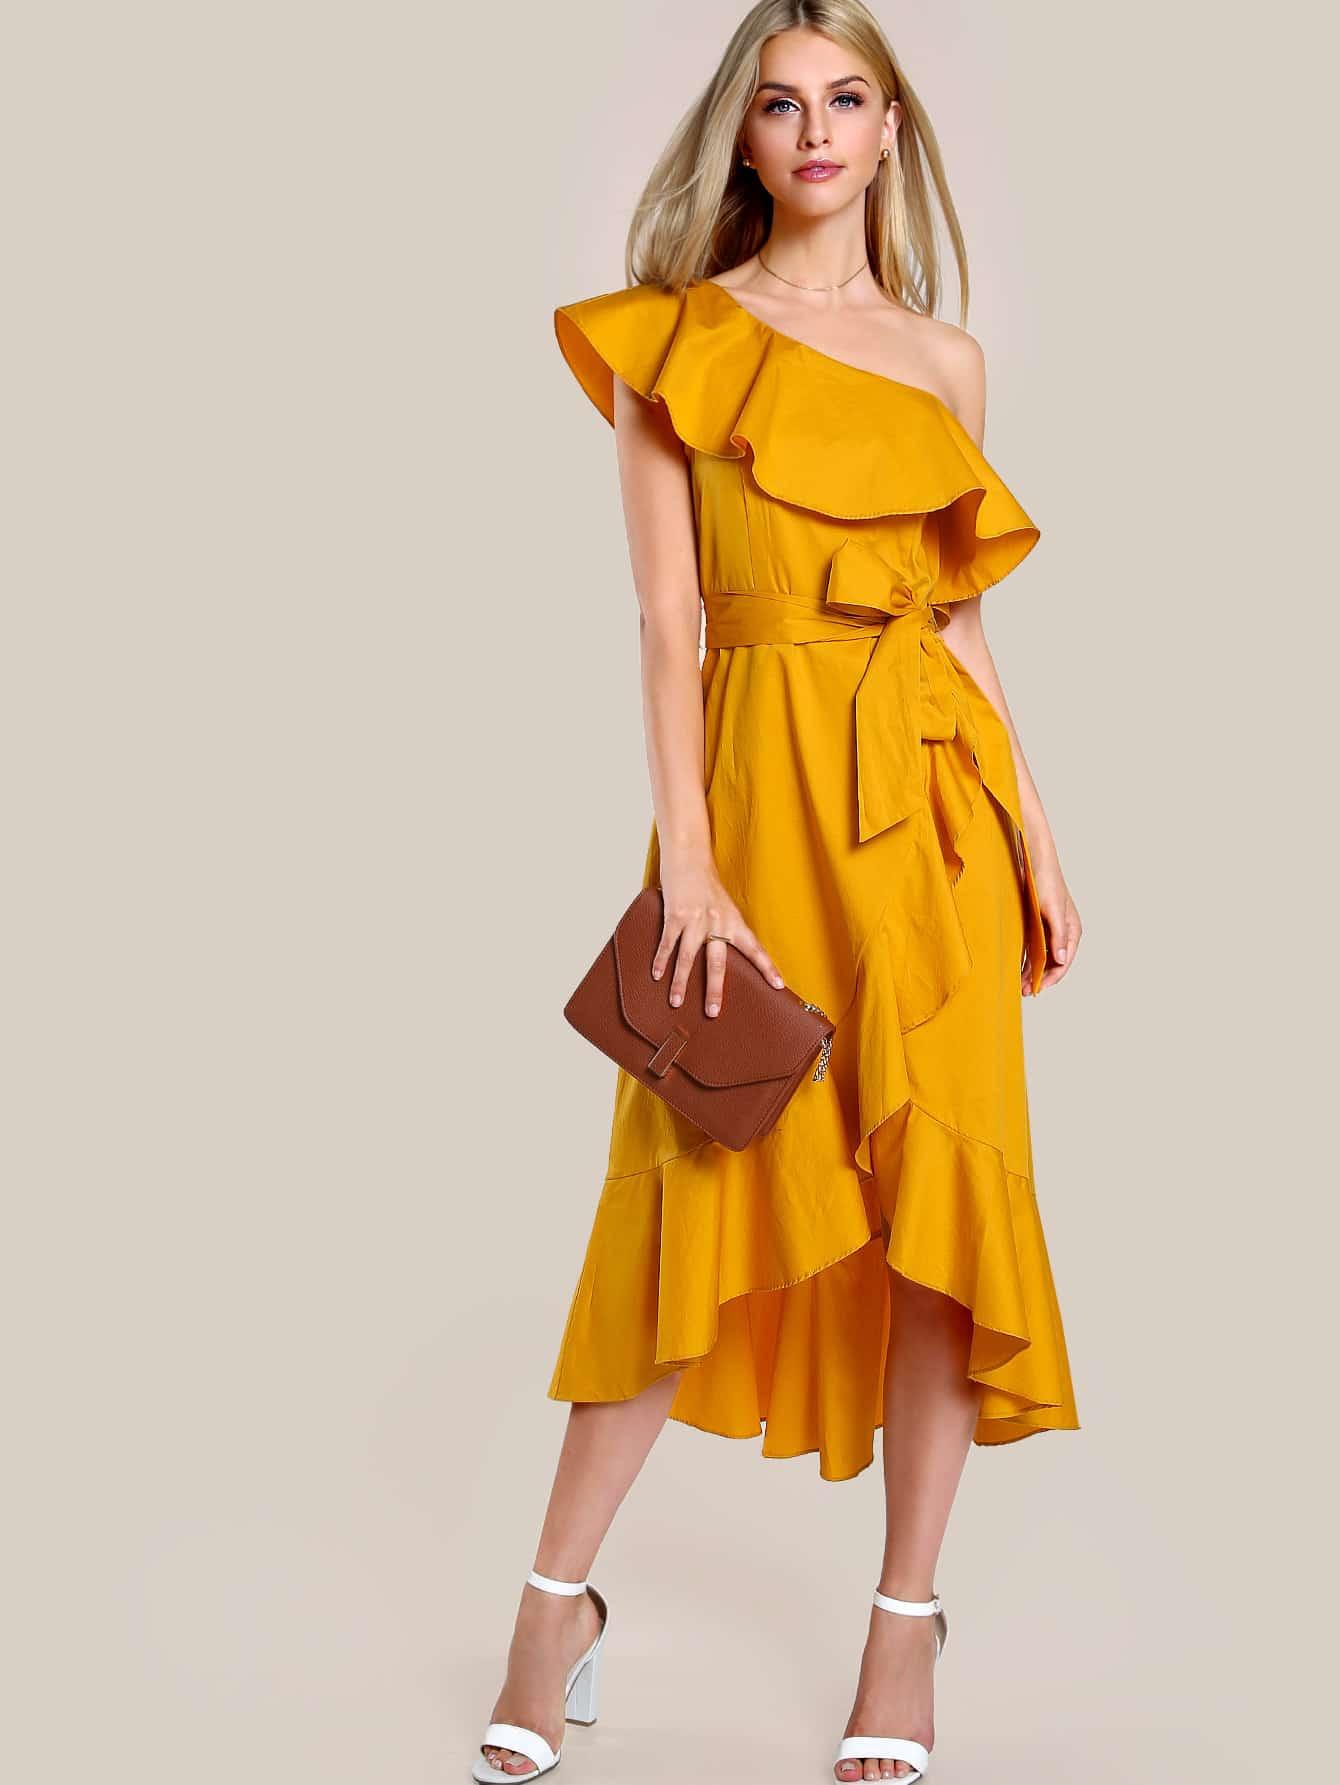 Ruffle Hem Single Shoulder Overlap Dress